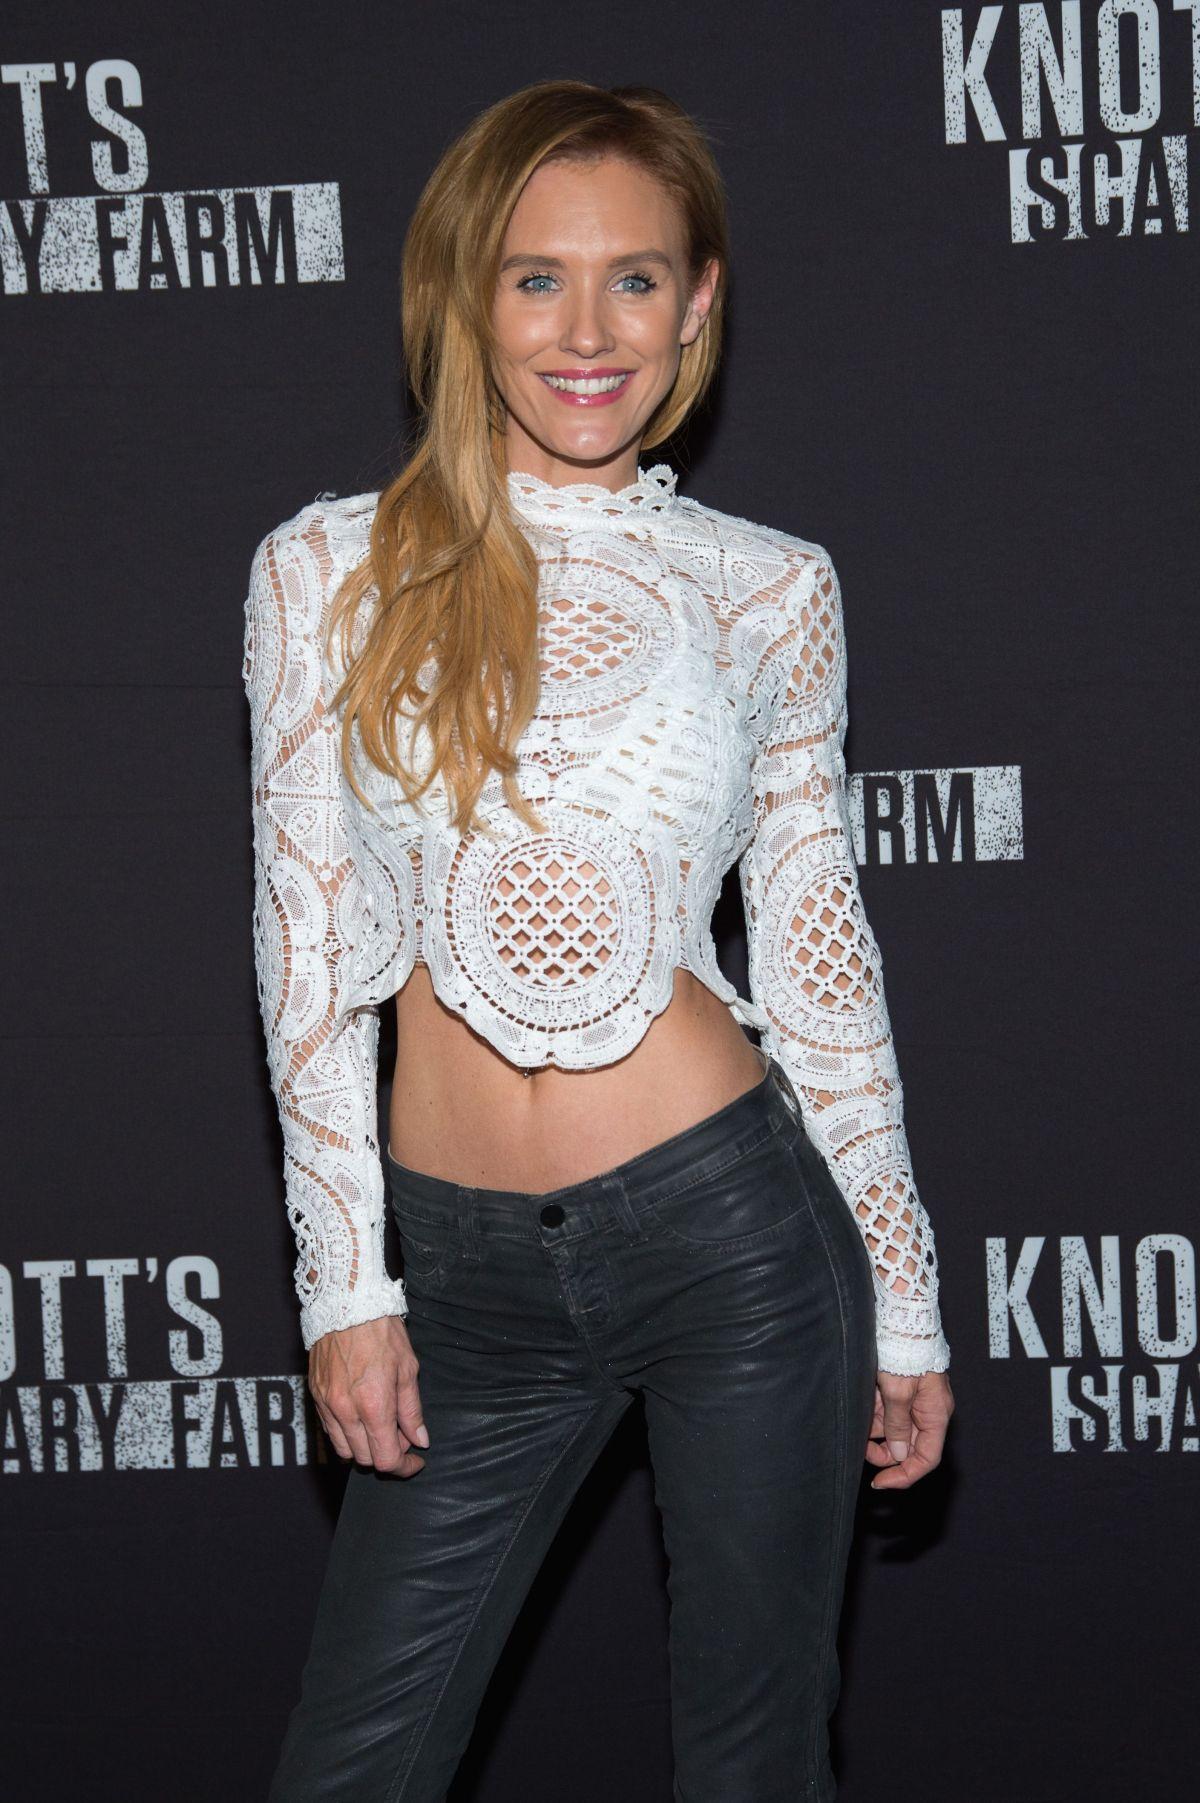 Nicky Simone Zimmermann Eva Rinaldi Flickr Miranda Kerr In